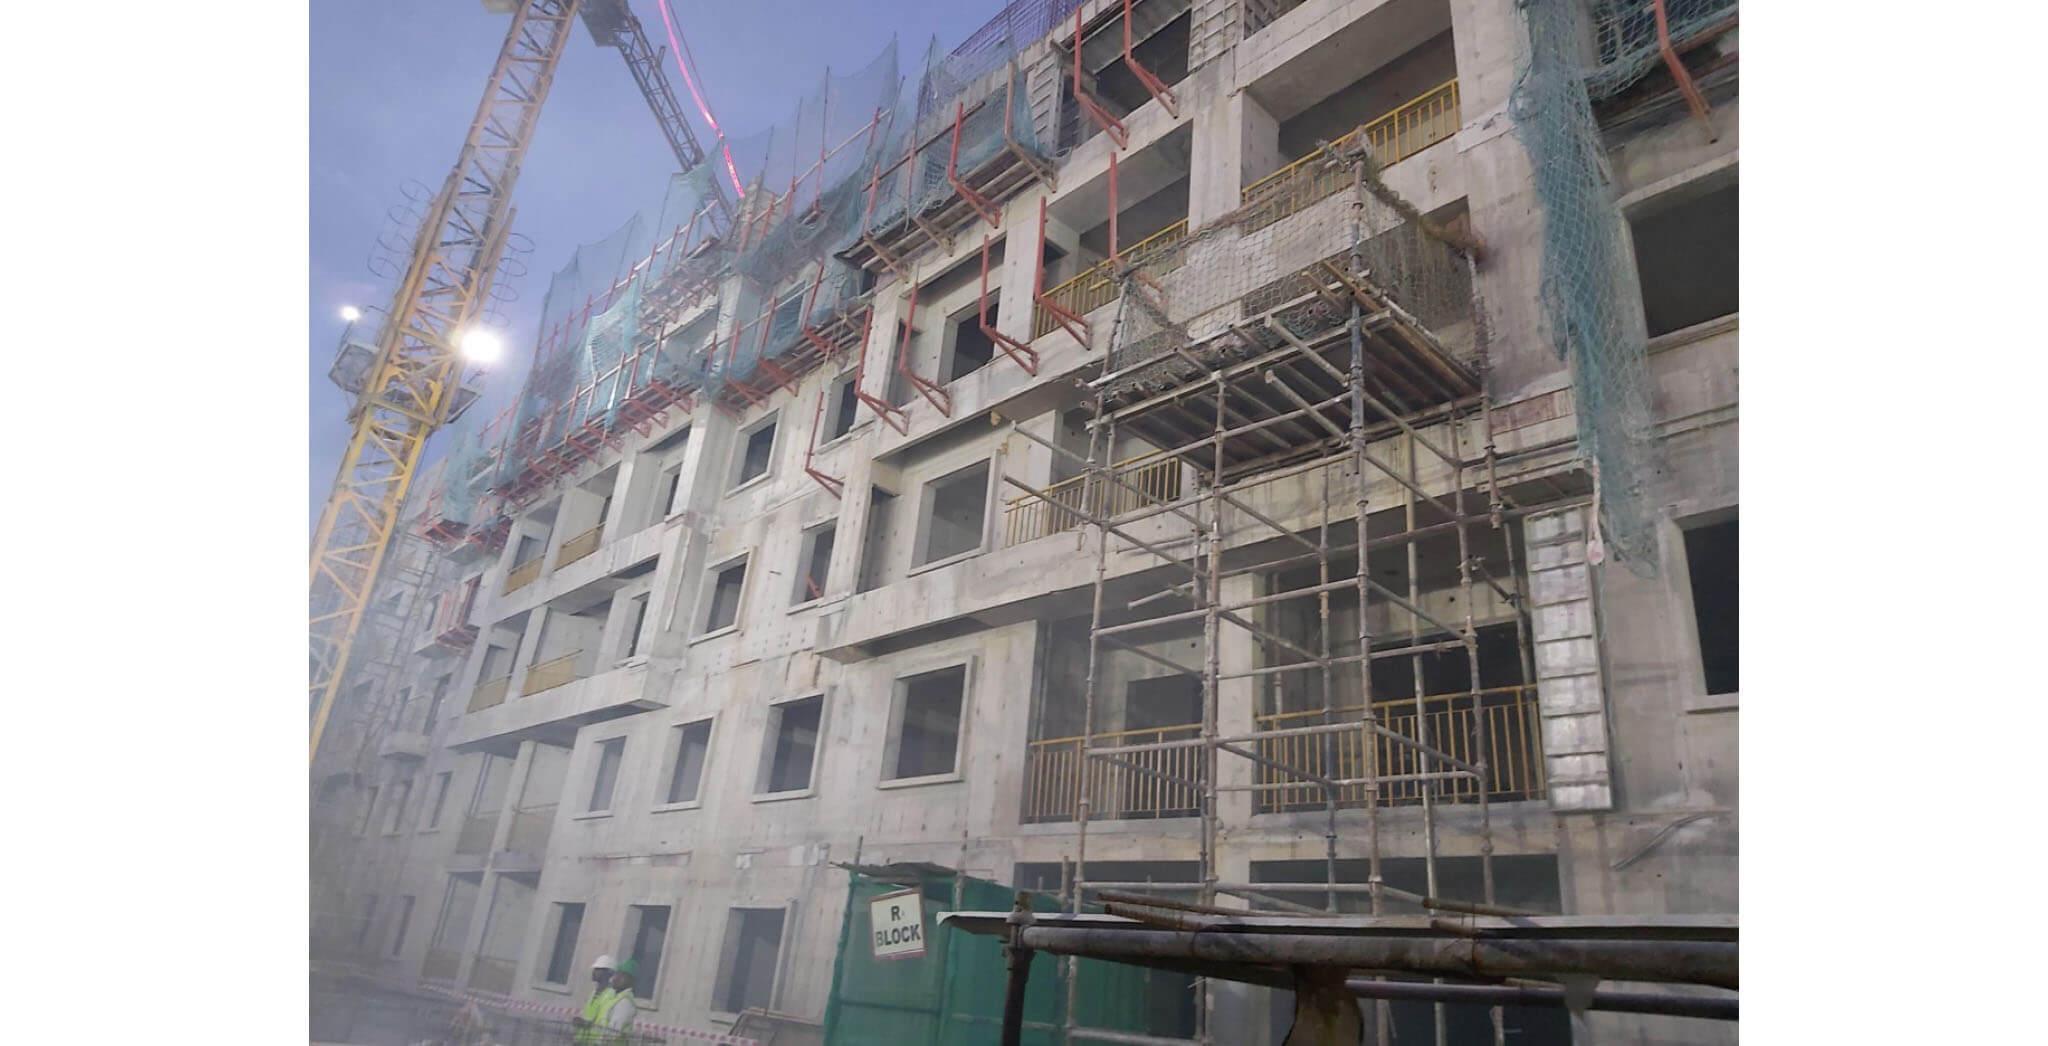 Jan 2020 - R Block: Above terrace work-in-progress